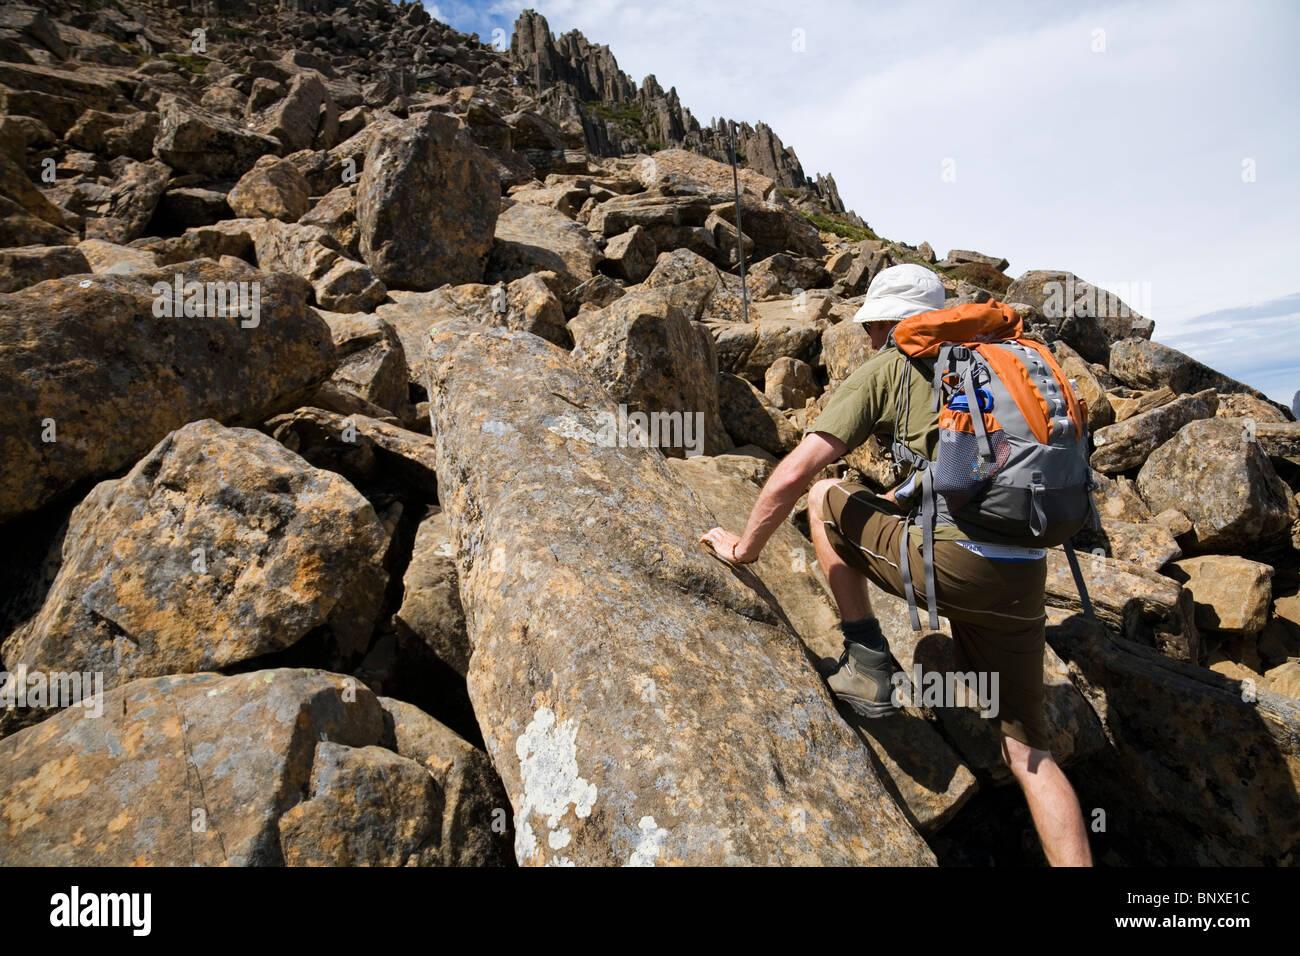 A hiker on the Cradle Mountain summit trail. Cradle Mountain-Lake St Clair National Park, Tasmania, AUSTRALIA - Stock Image